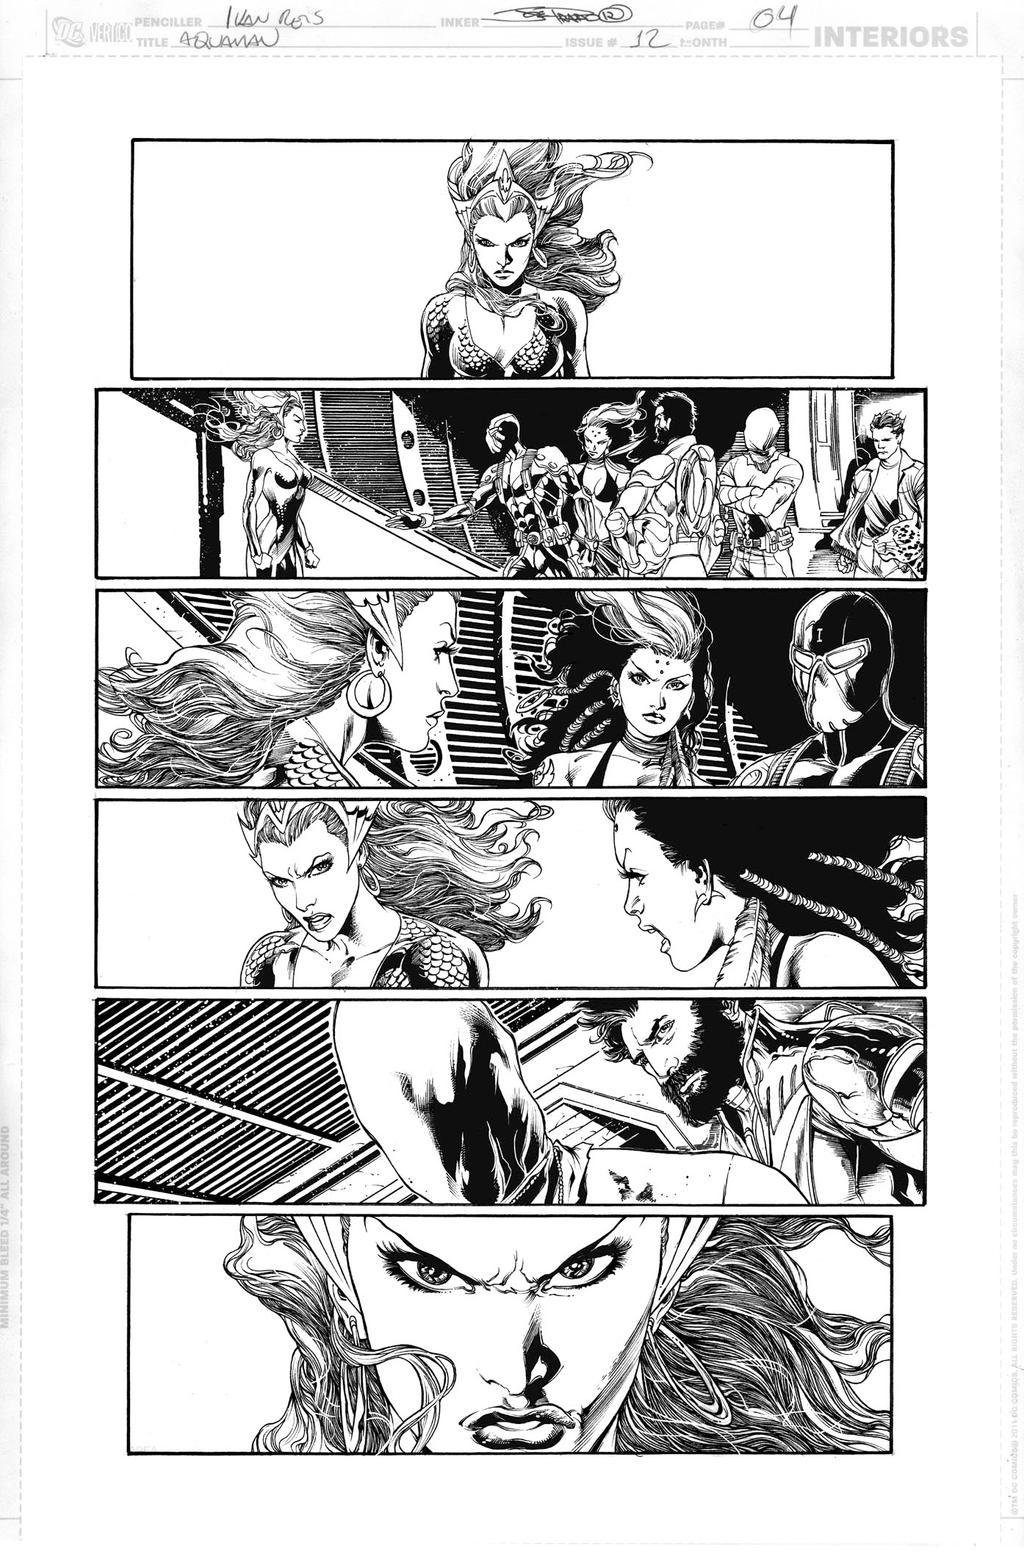 AQUAMAN Issue 12 Page 04 by JoePrado2010